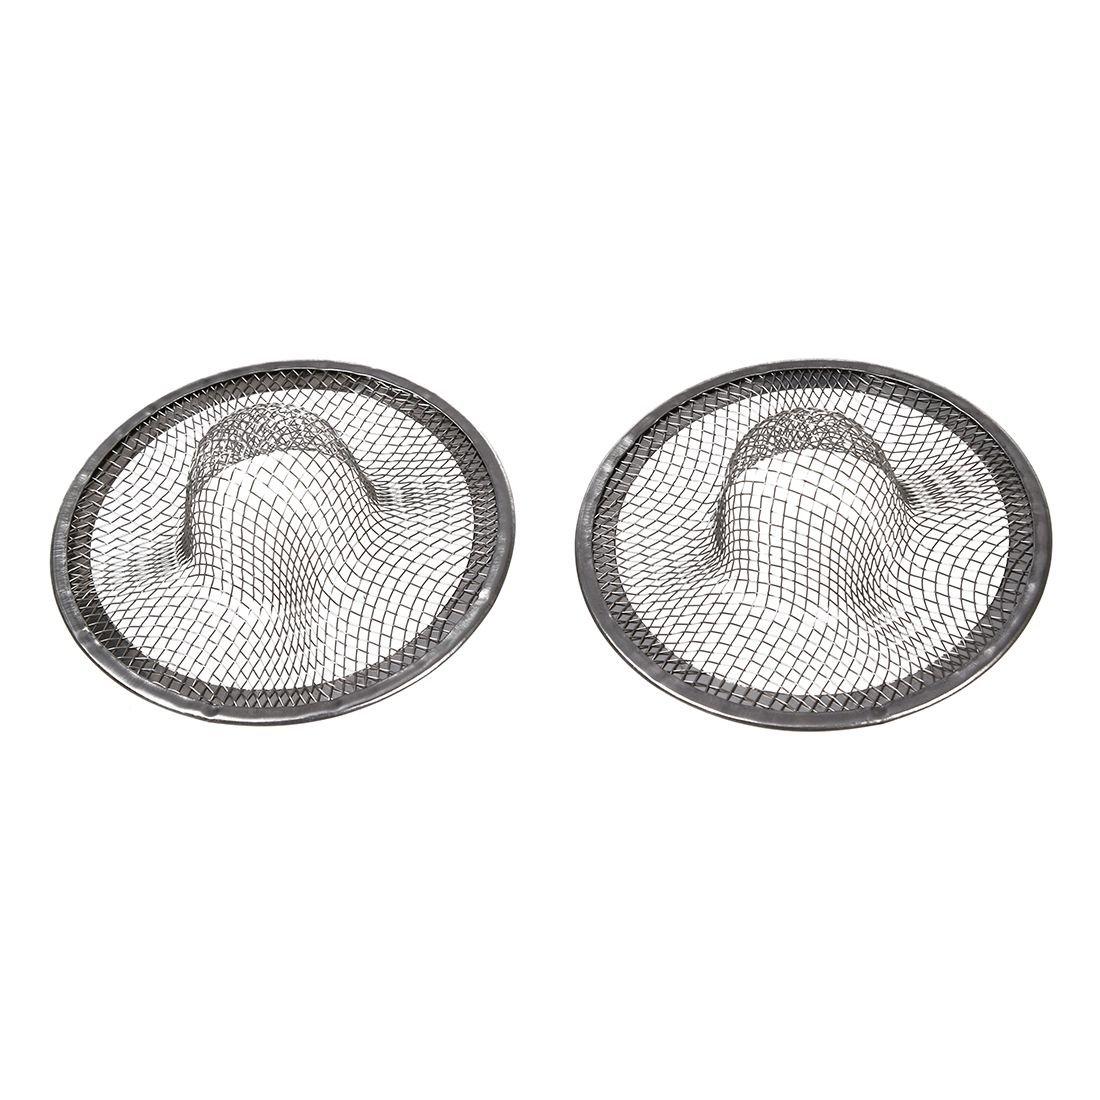 SODIAL(R) Stainless Steel Drainer Basin Filter Mesh Sink Strainer 7cm Dia 2PCS